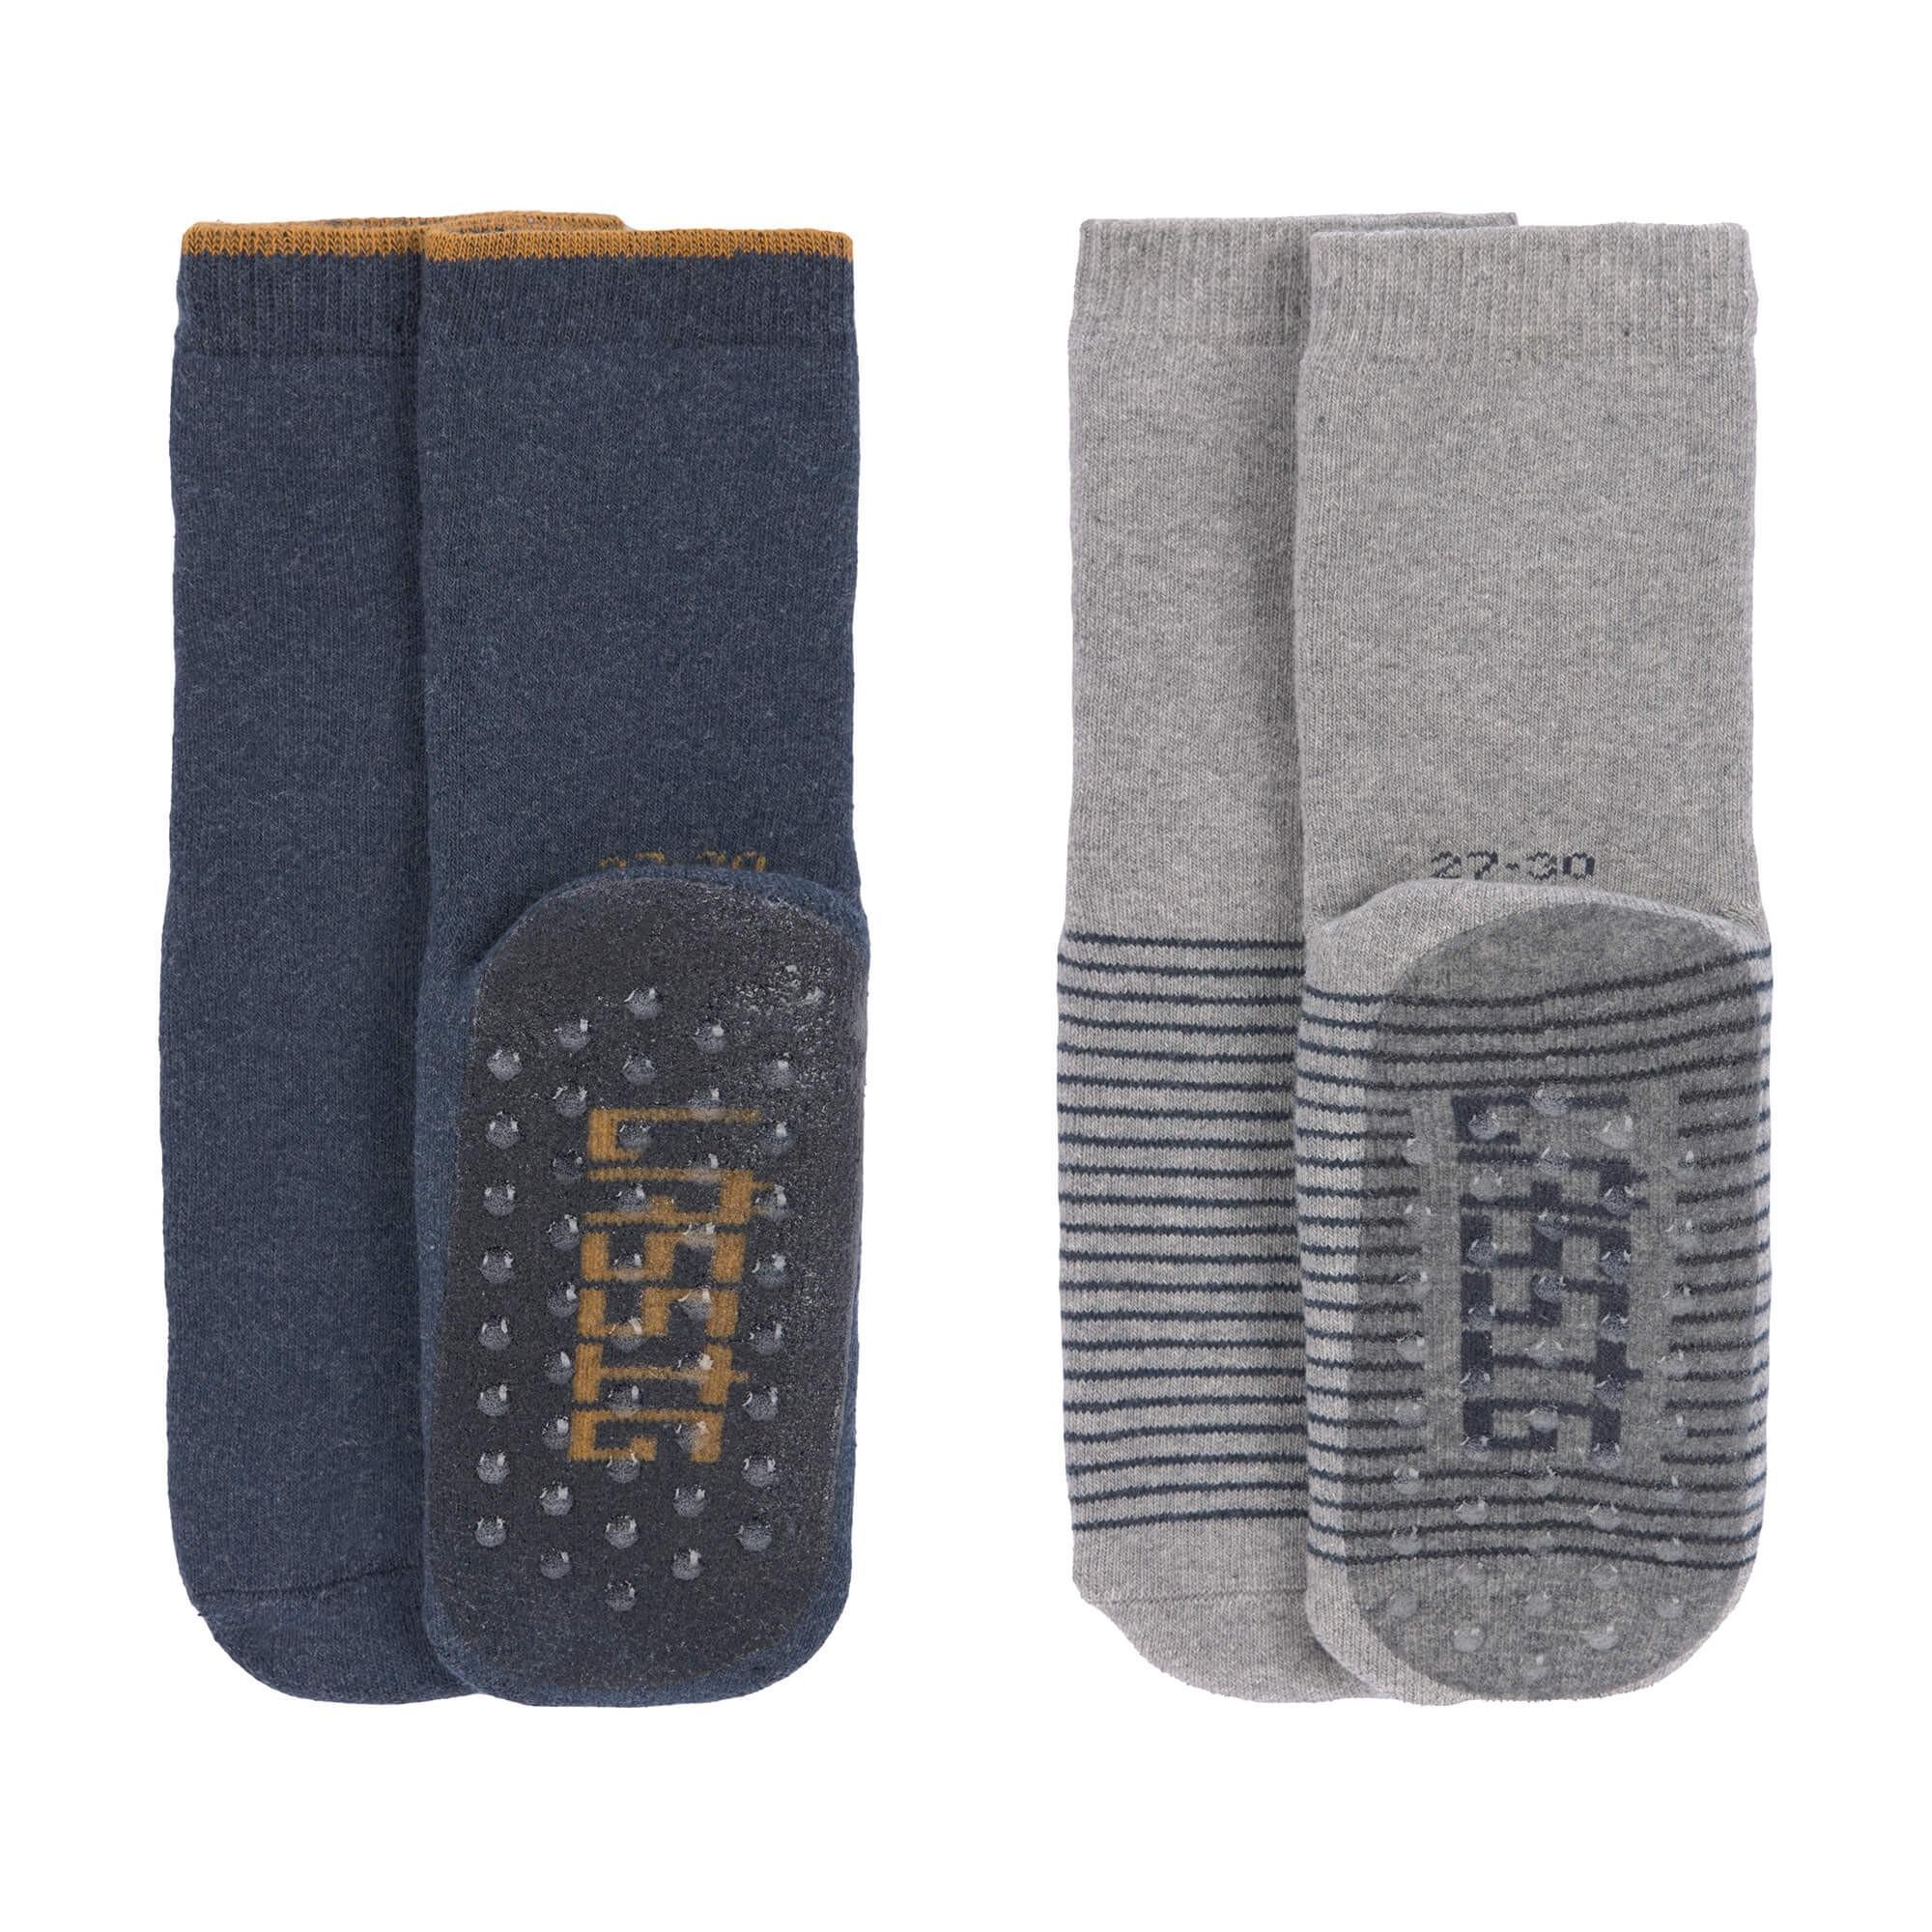 Lassig - Anti-slip Socks 2 pcs. assorted blue/grey, Size: 19-22